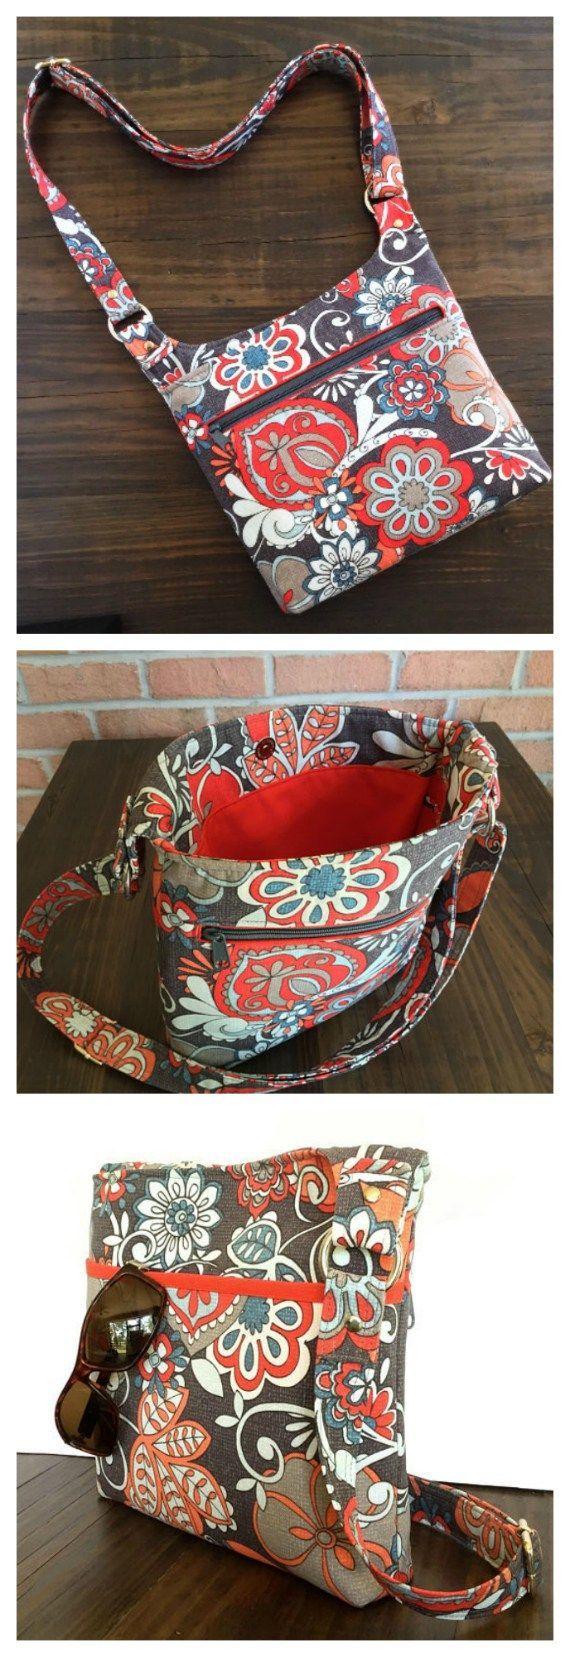 Vanessa - Hipster purse pattern,  #FITNESS #Hipster #Pattern #Purse #Vanessa